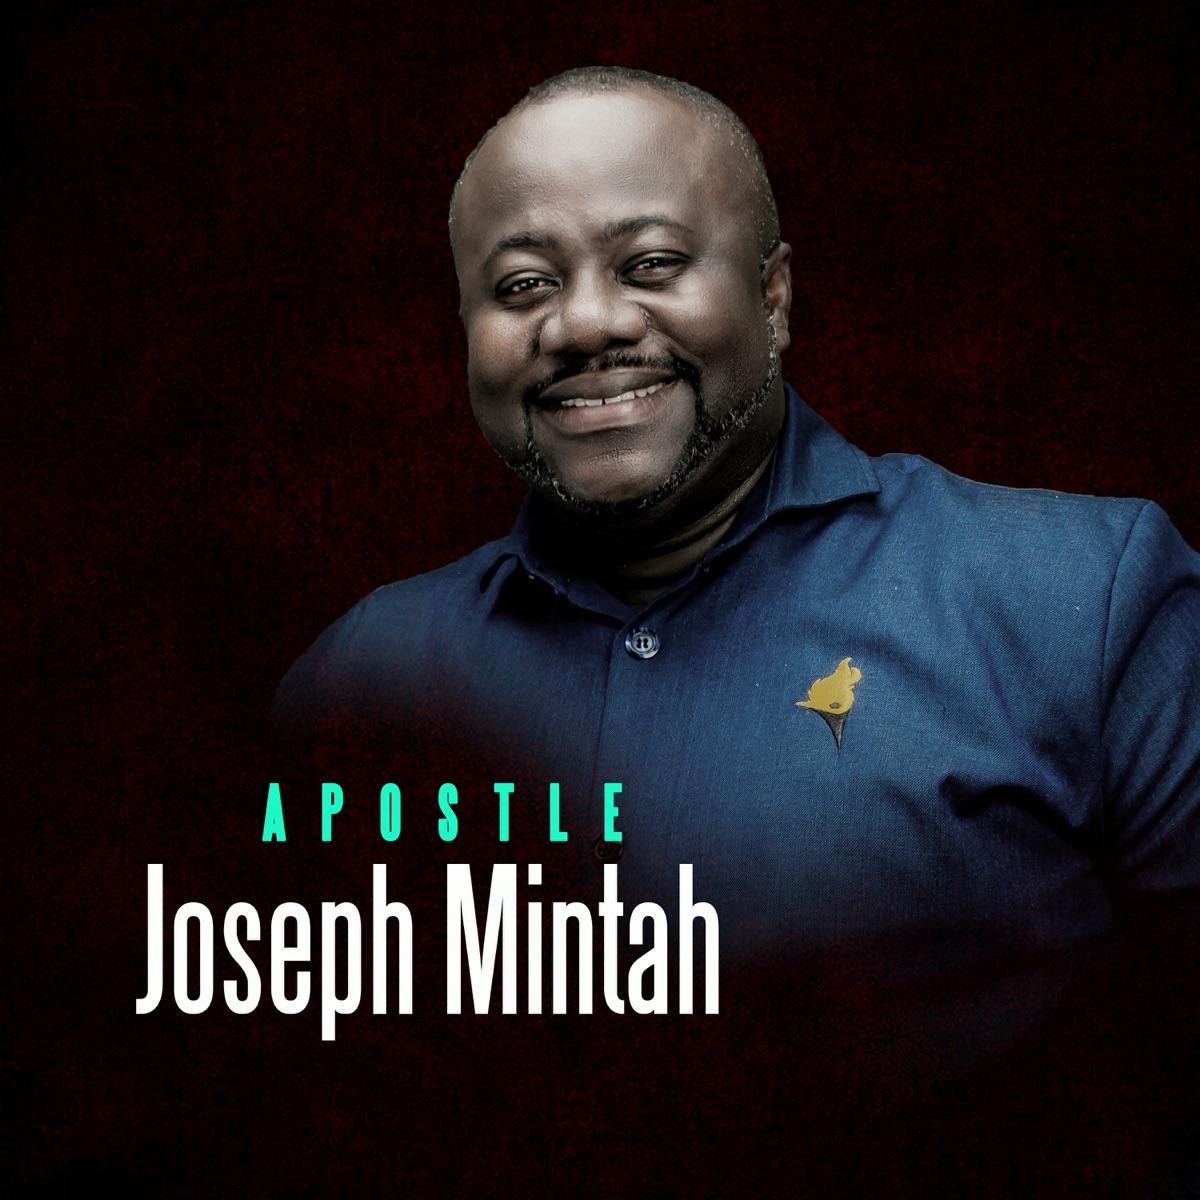 Apostle Joseph Mintah